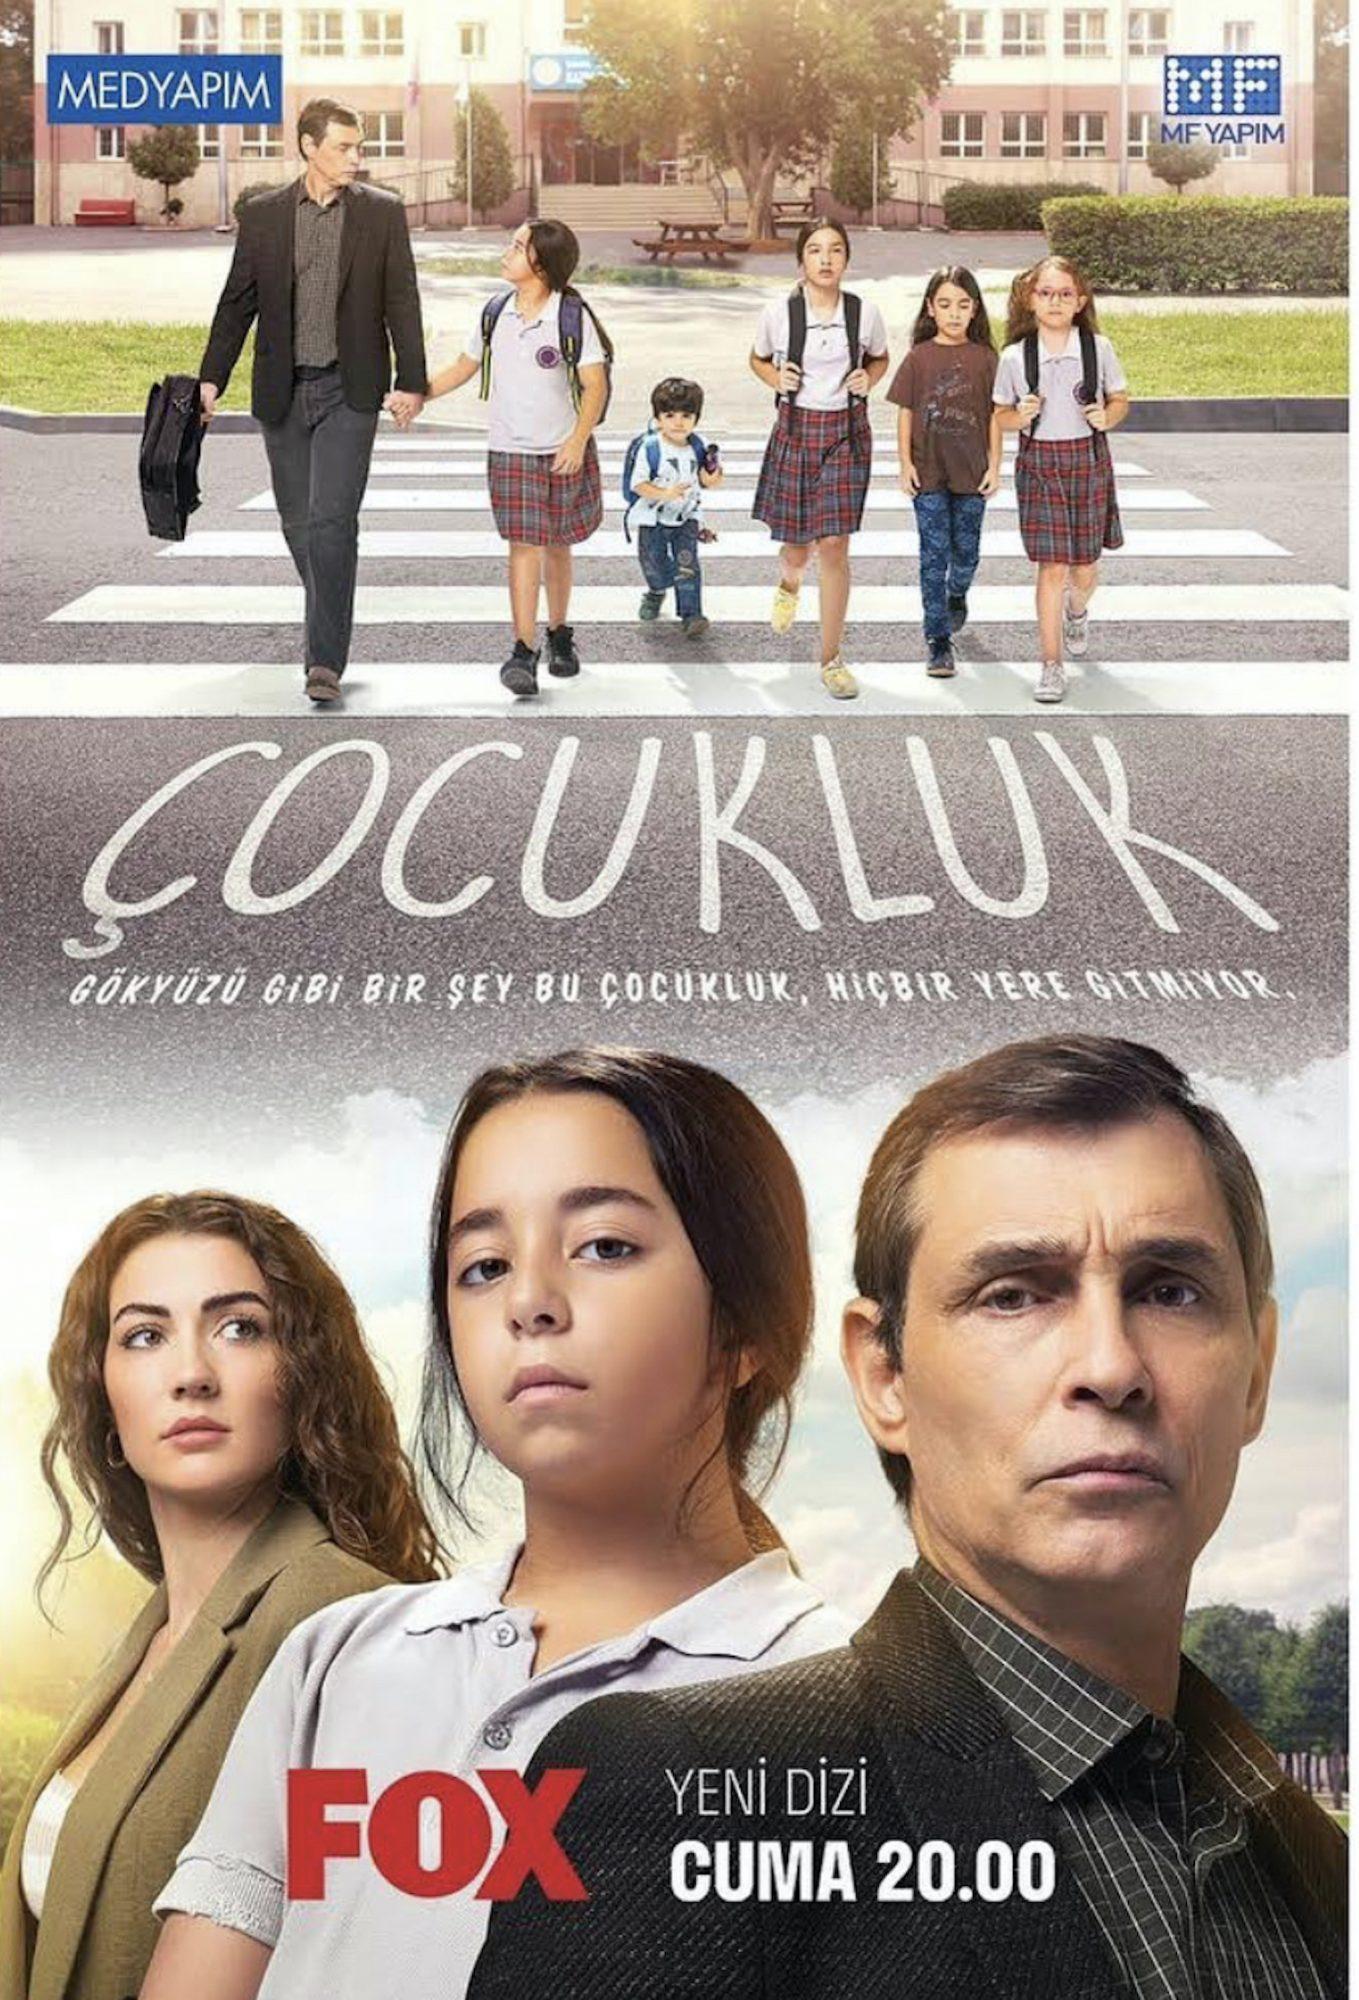 Póster promocional nueva telenovela de Beren Gokyildiz